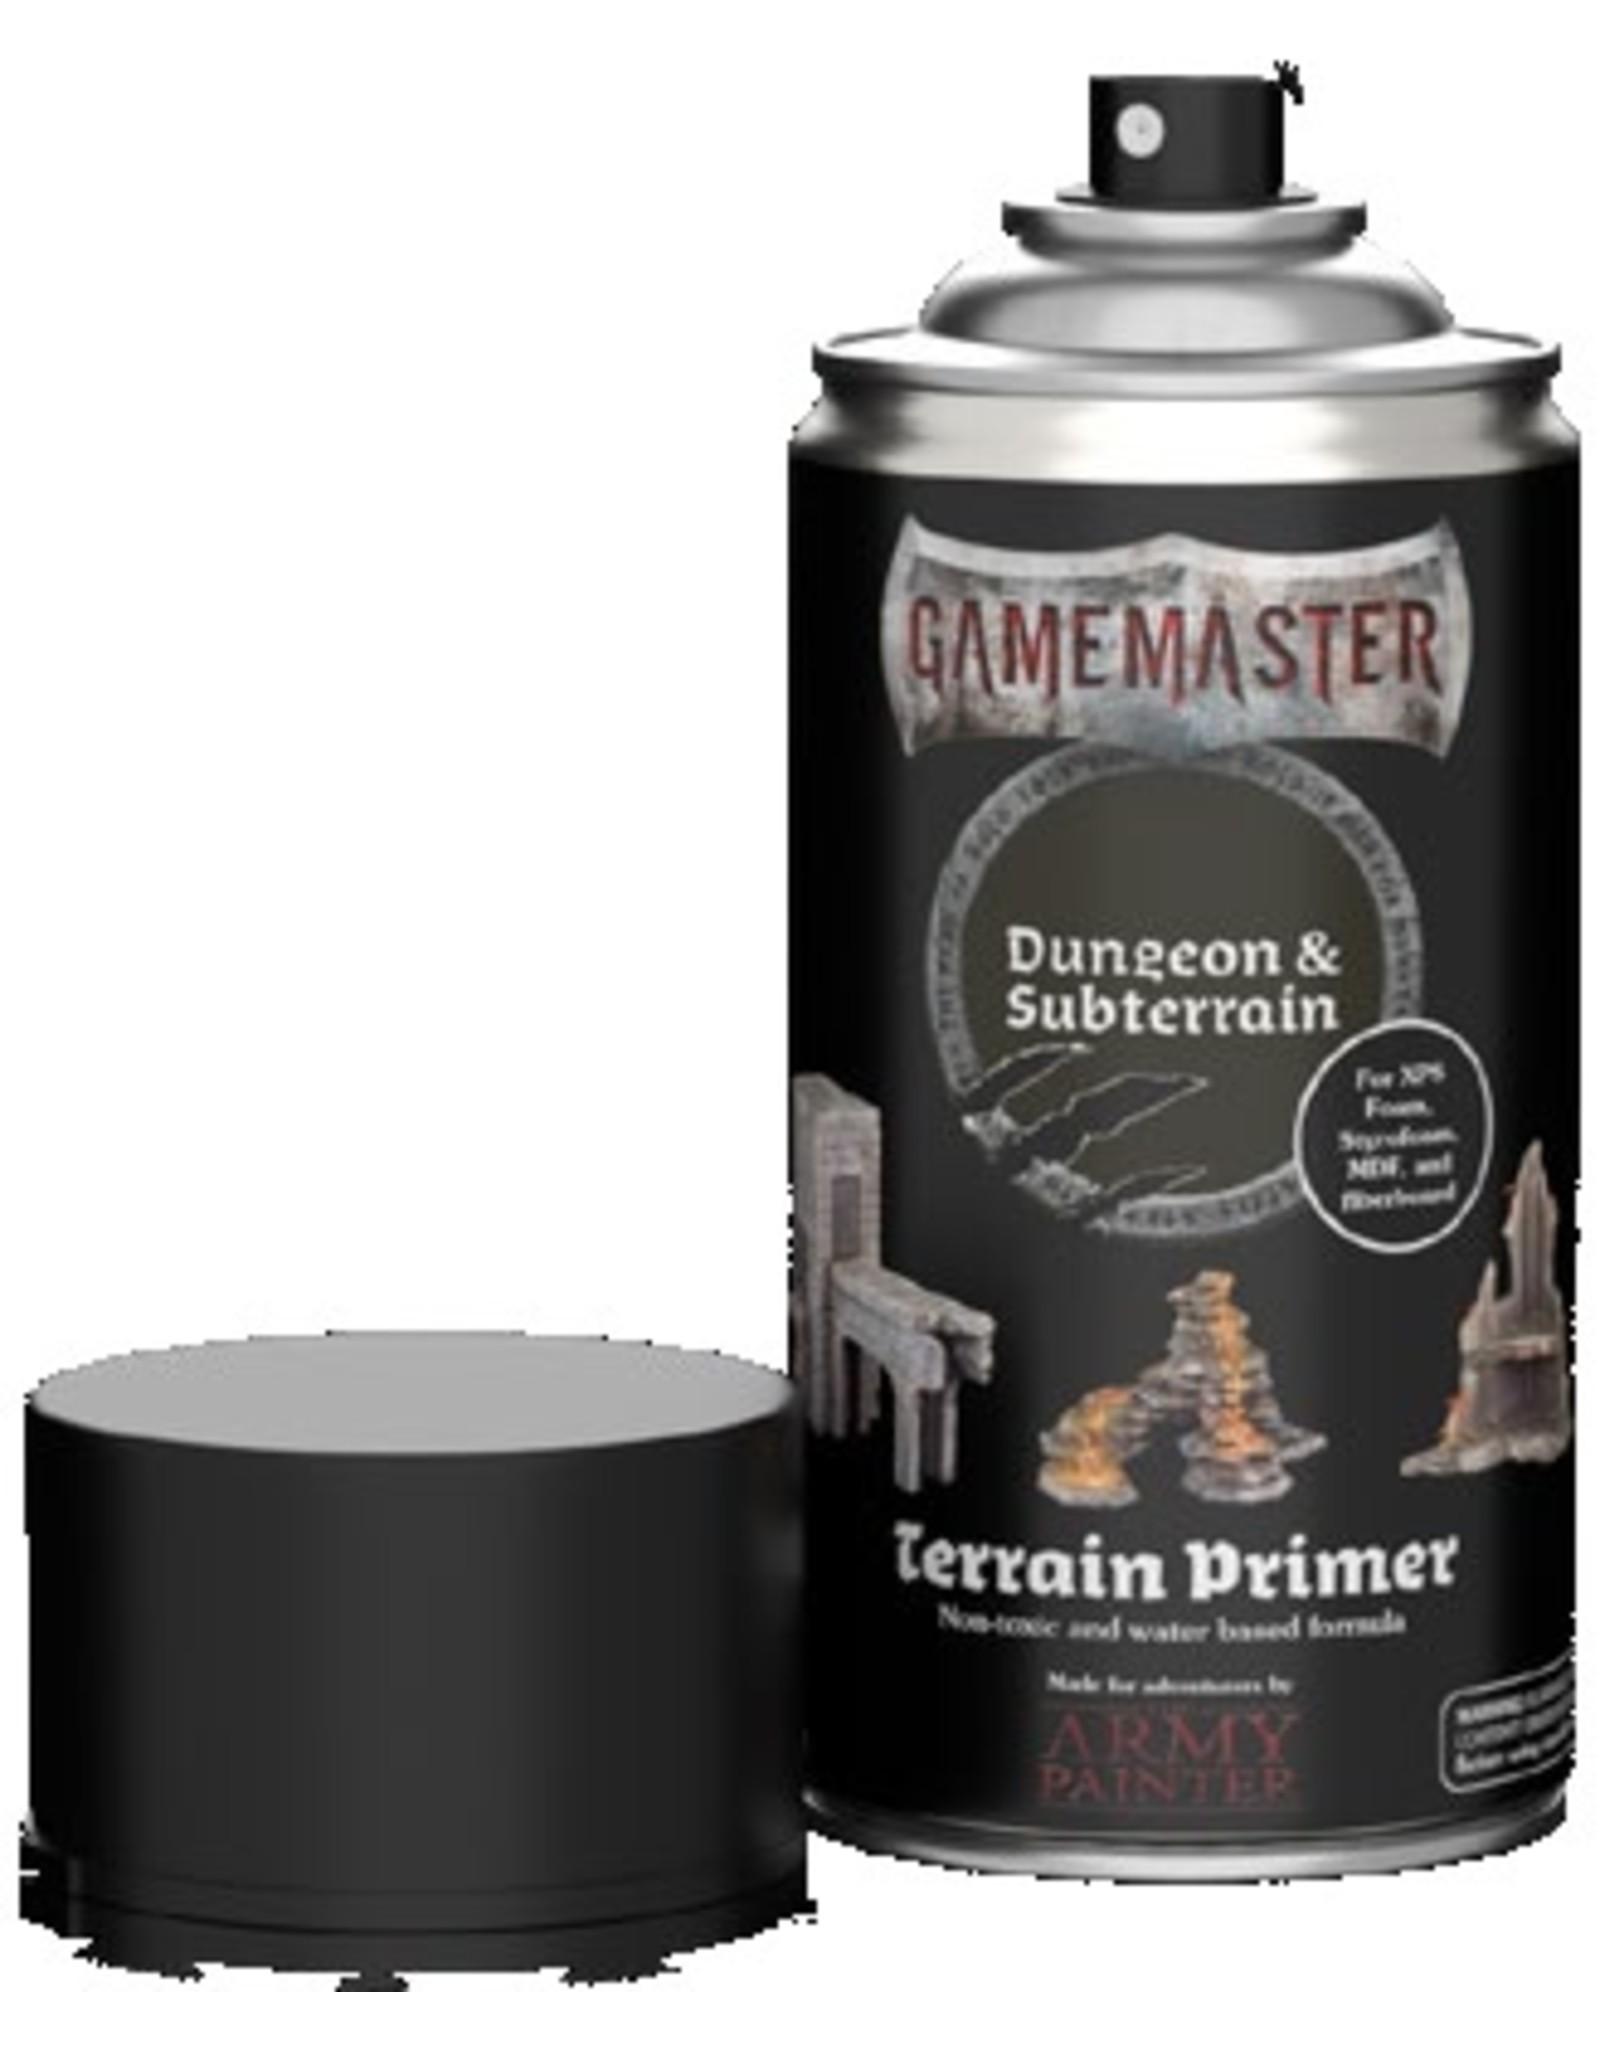 Army Painter Gamemaster: Terrain Primer: Dungeon & Subterrain